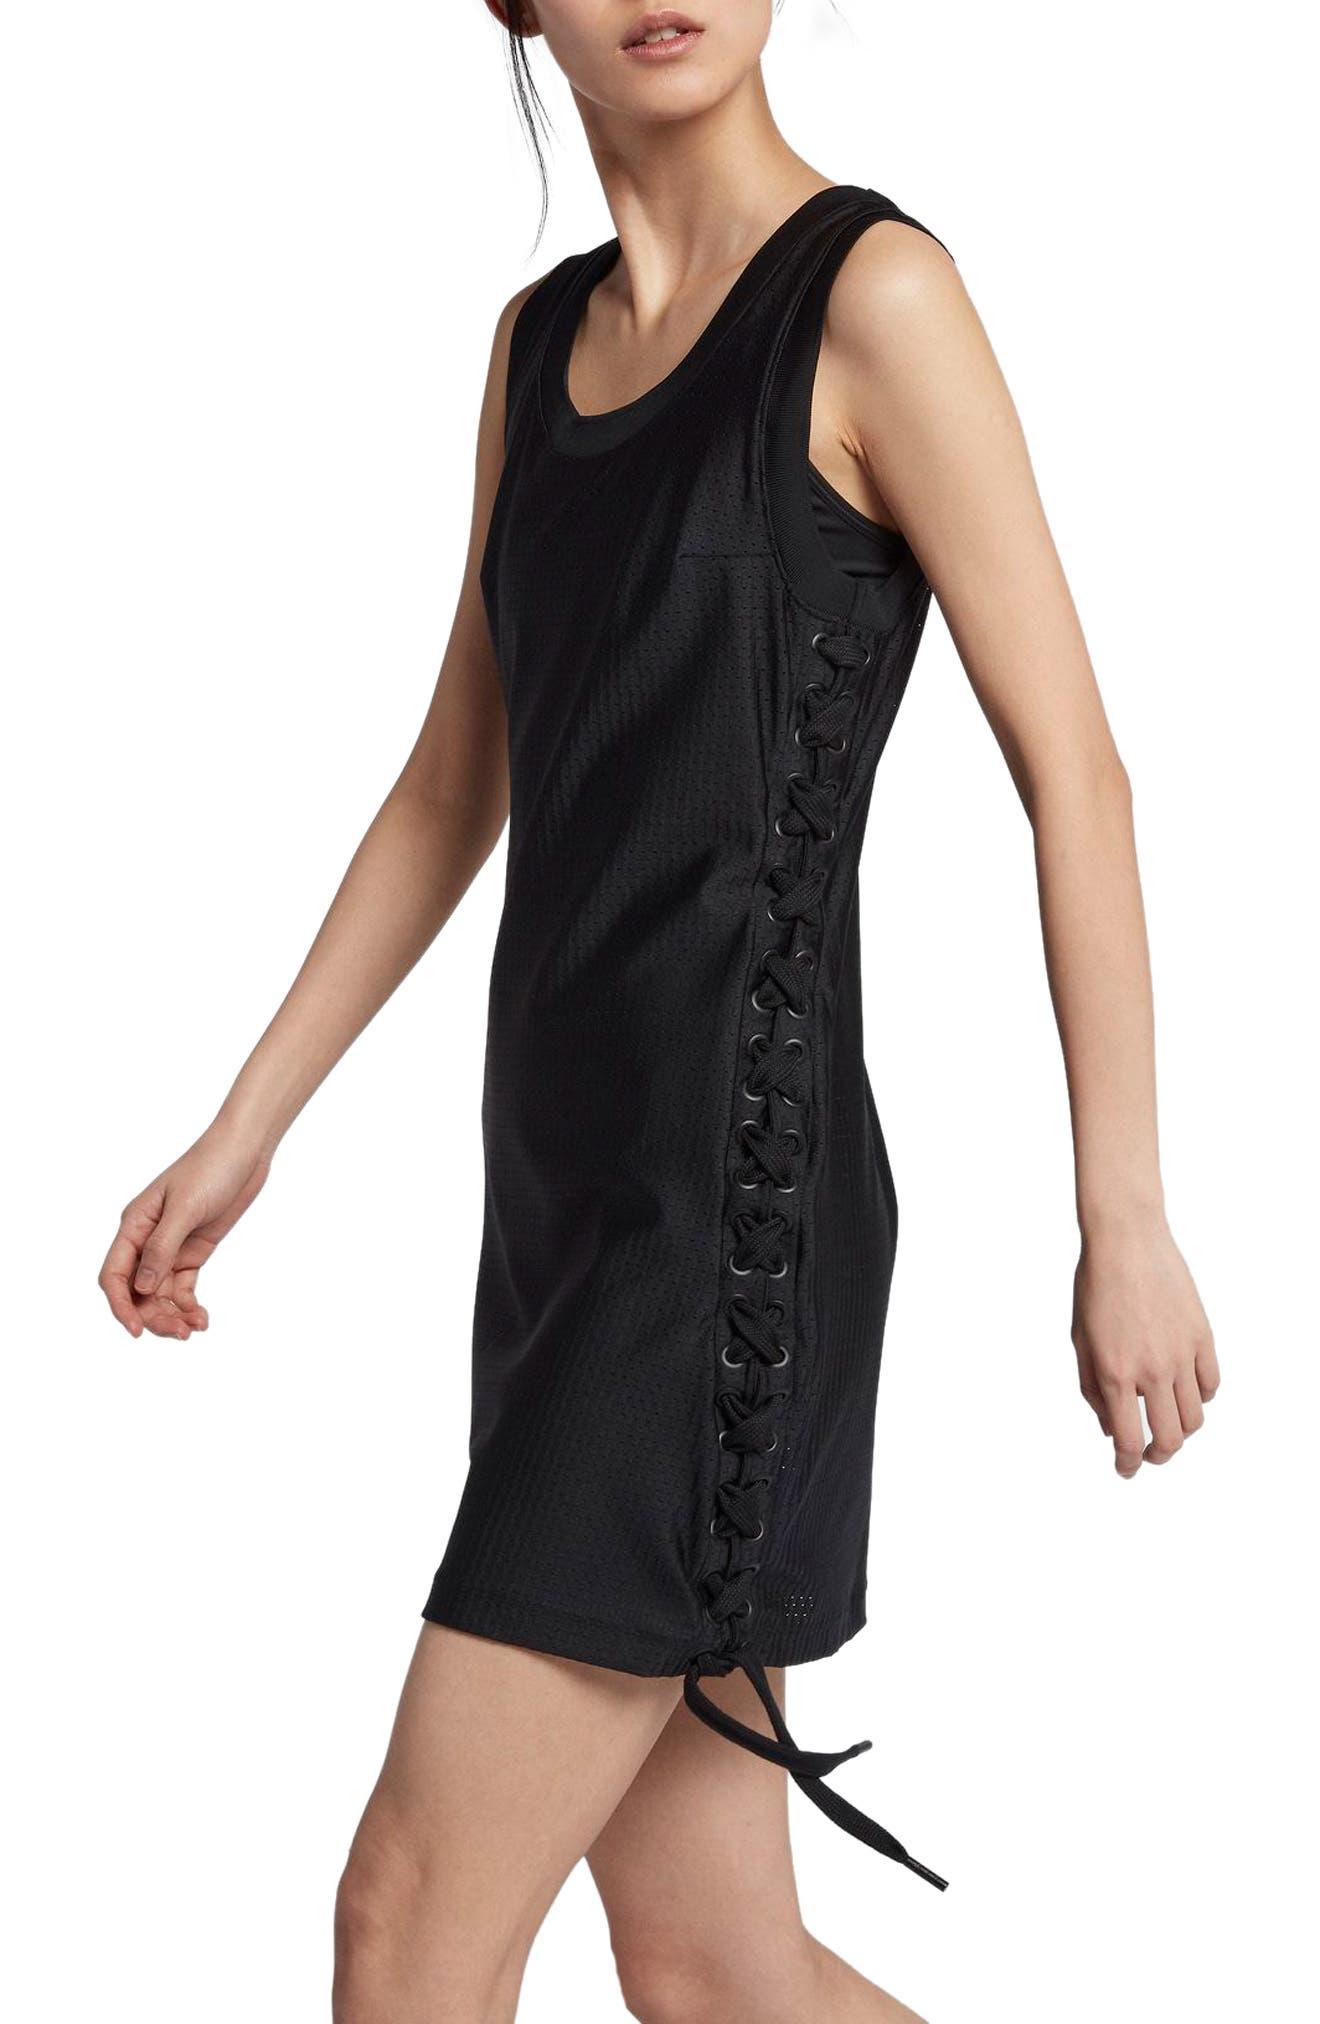 NikeLab x RT Jersey & Mesh Dress,                             Alternate thumbnail 3, color,                             010